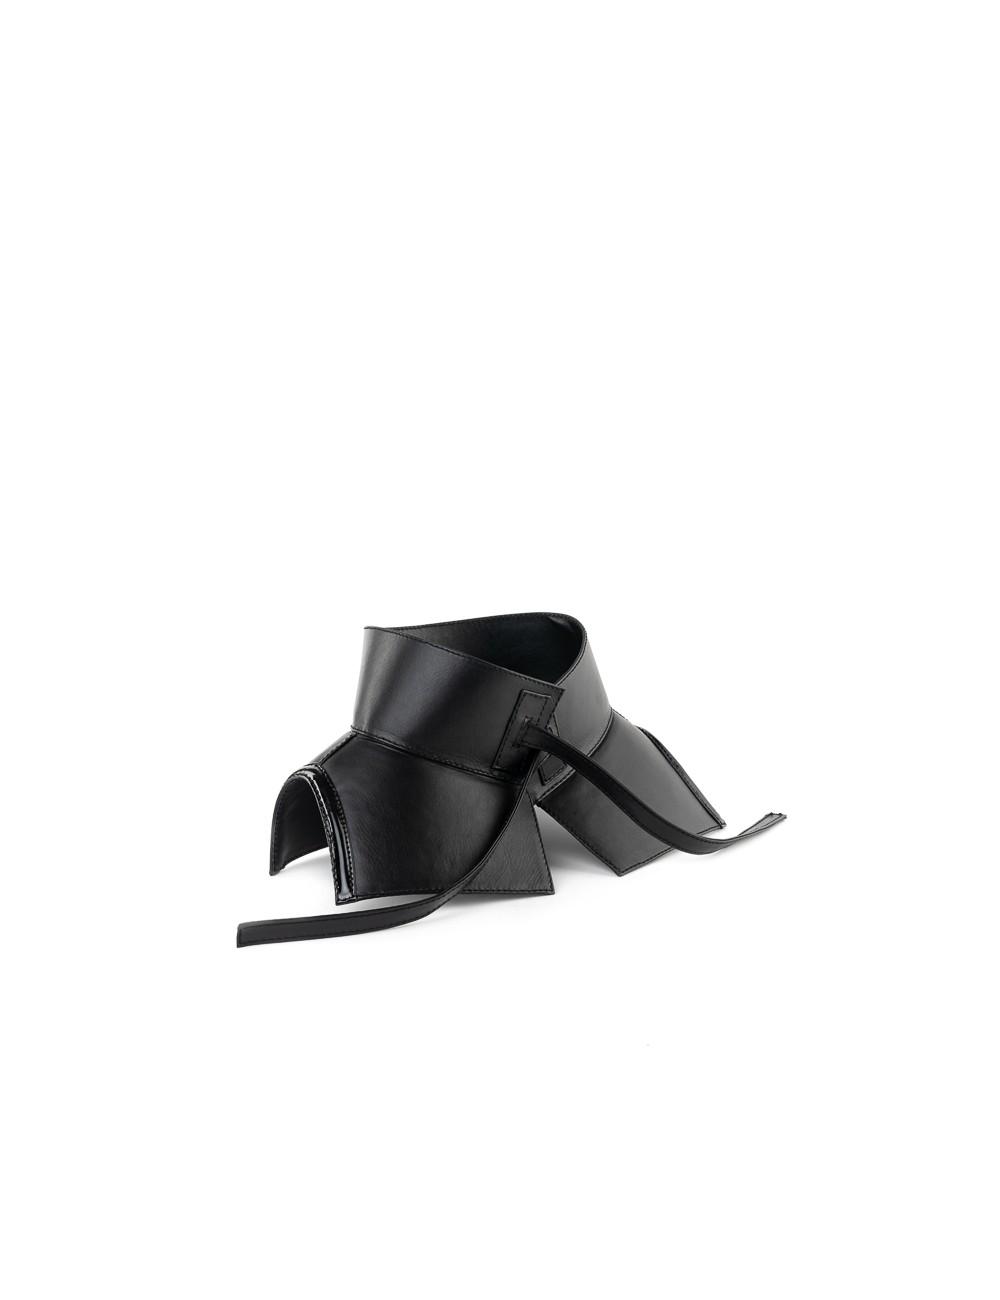 Corset Belt with ruffles